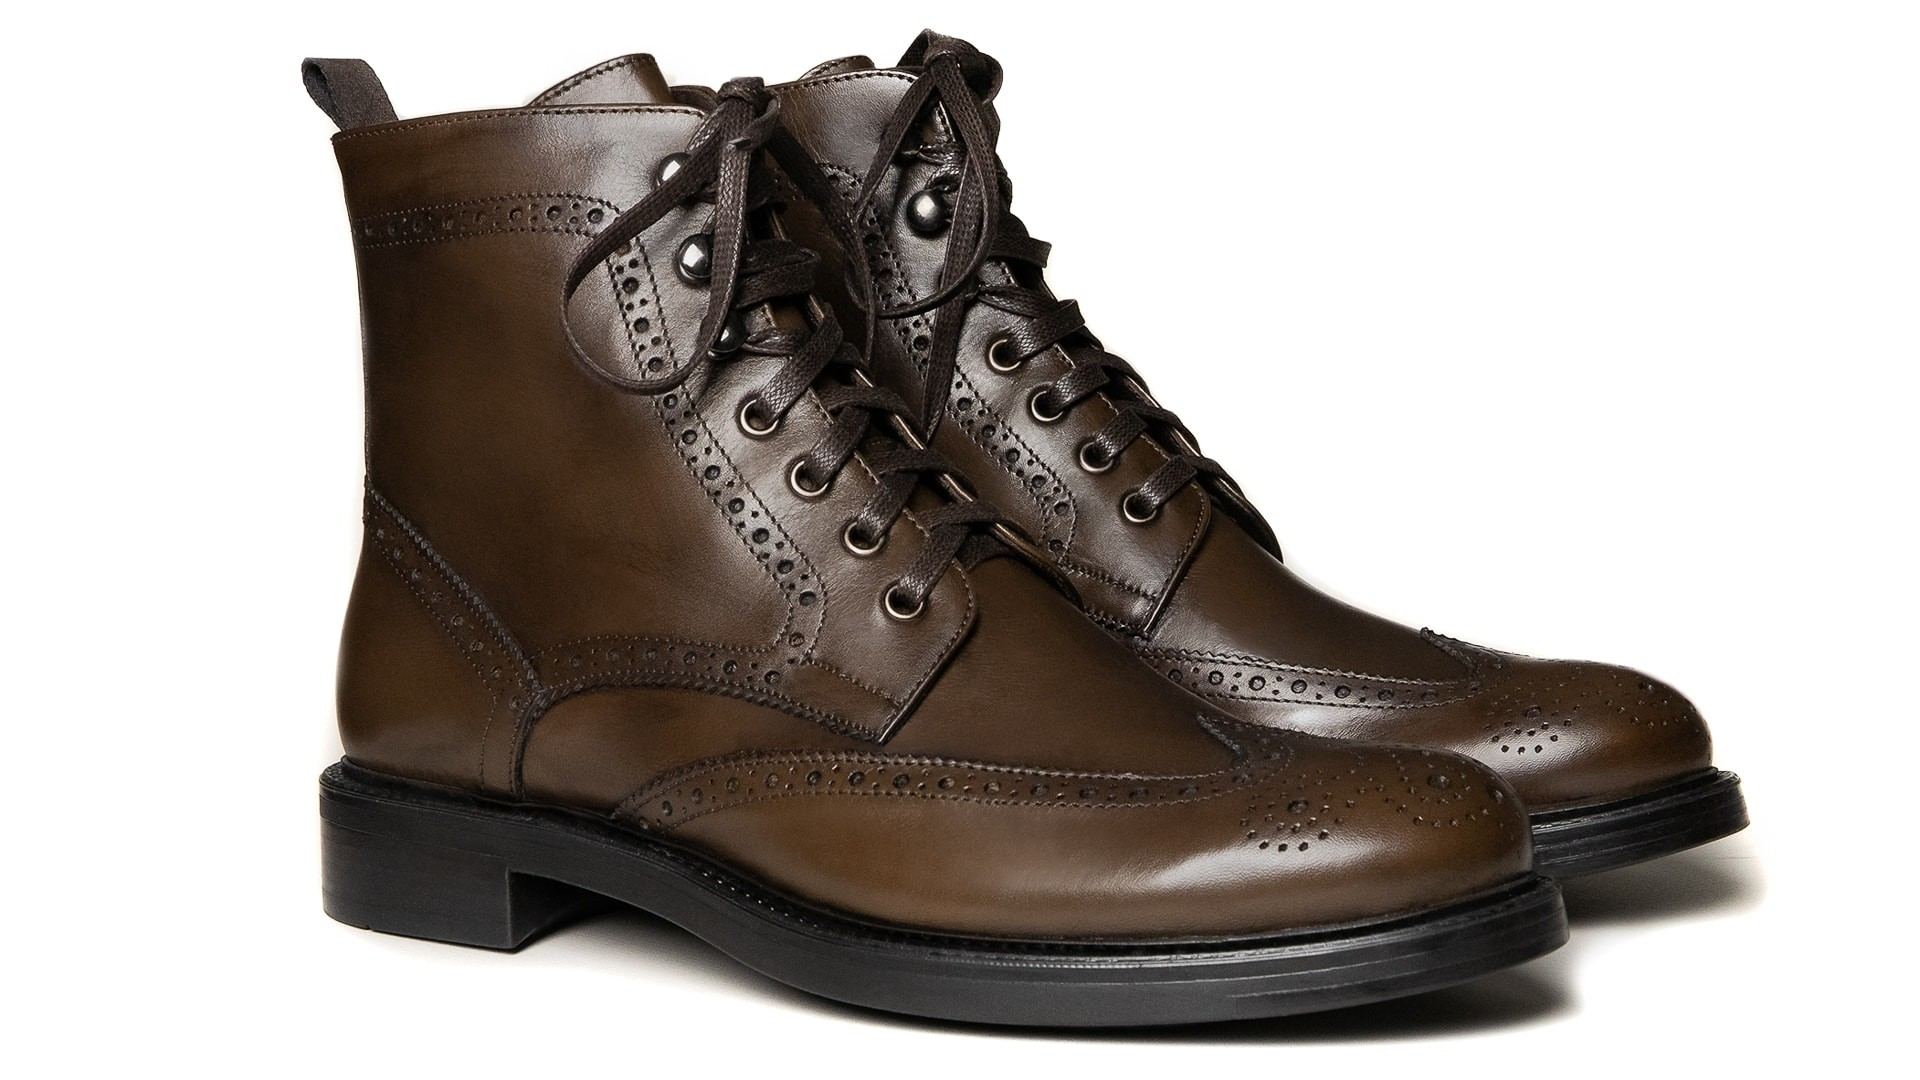 Brogue Boots Skóra Cielęca Legno